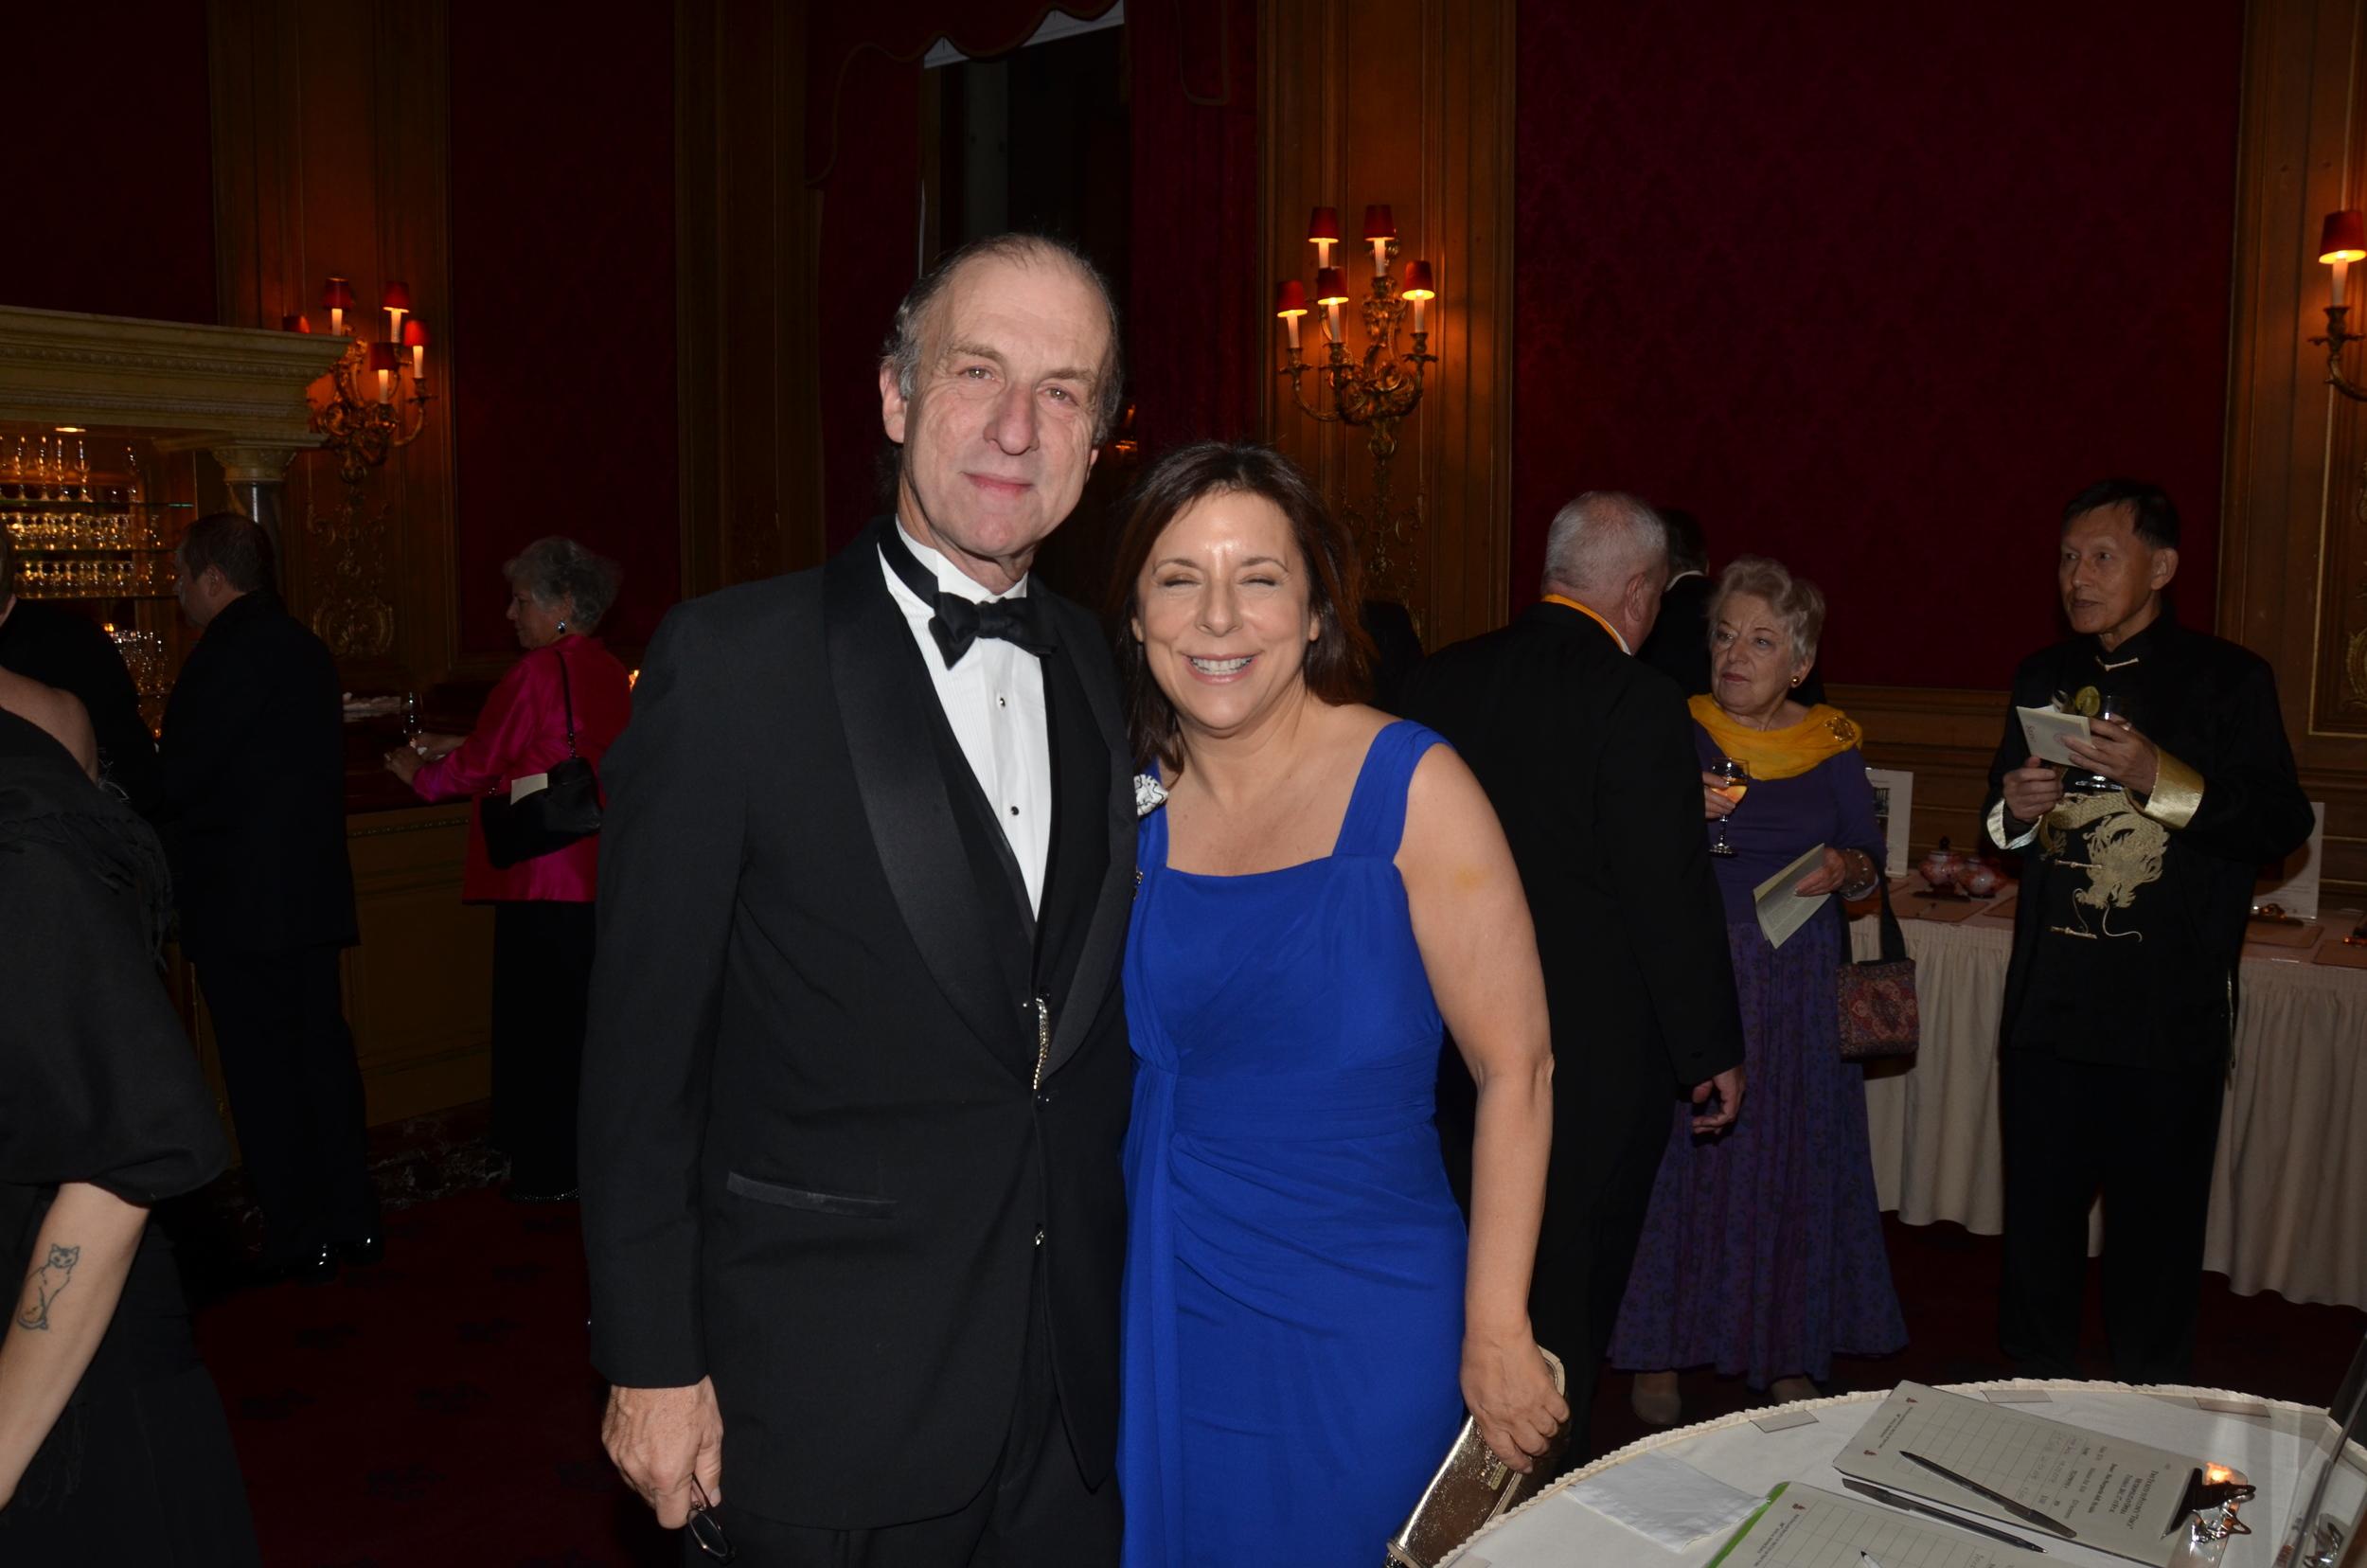 DSC_4142-Larry R Golding, Cynthia Sheps.JPG